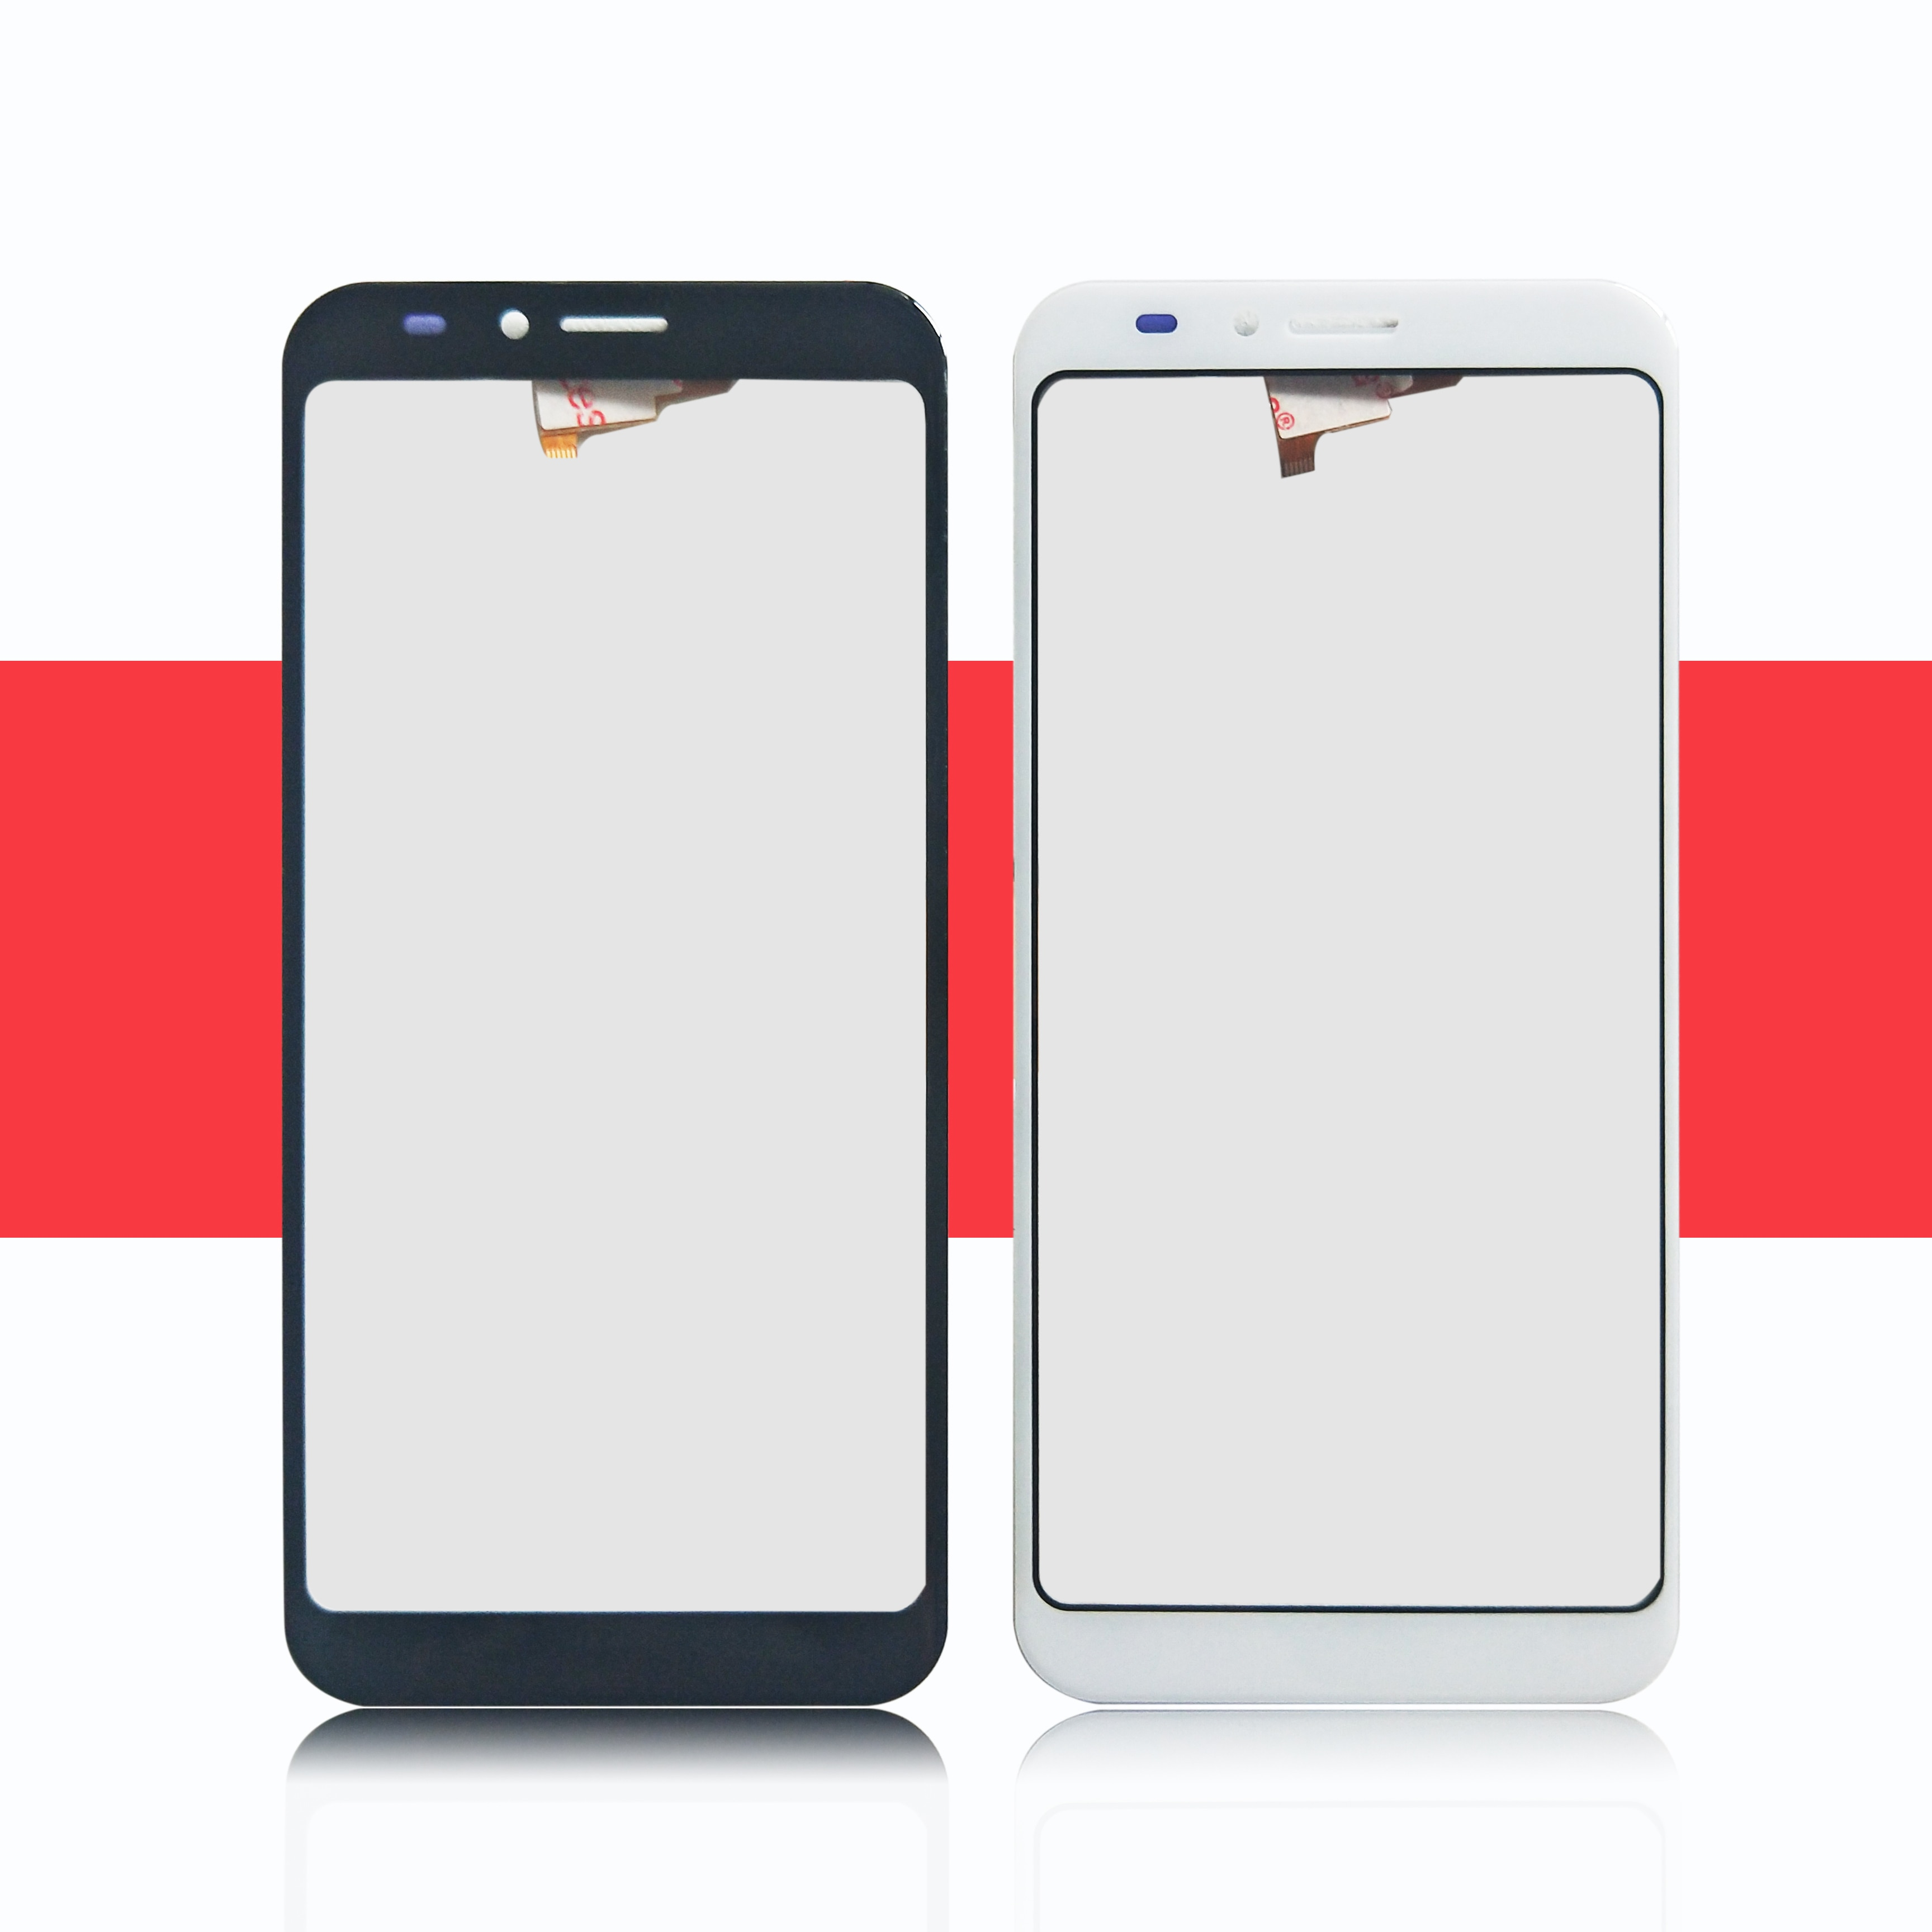 Nuevo, 5,5 pulgadas, para INOI kPhone / INOI kPhone 4G, sensor de cristal de pantalla táctil, panel de cristal, lente de repuesto para teléfono móvil